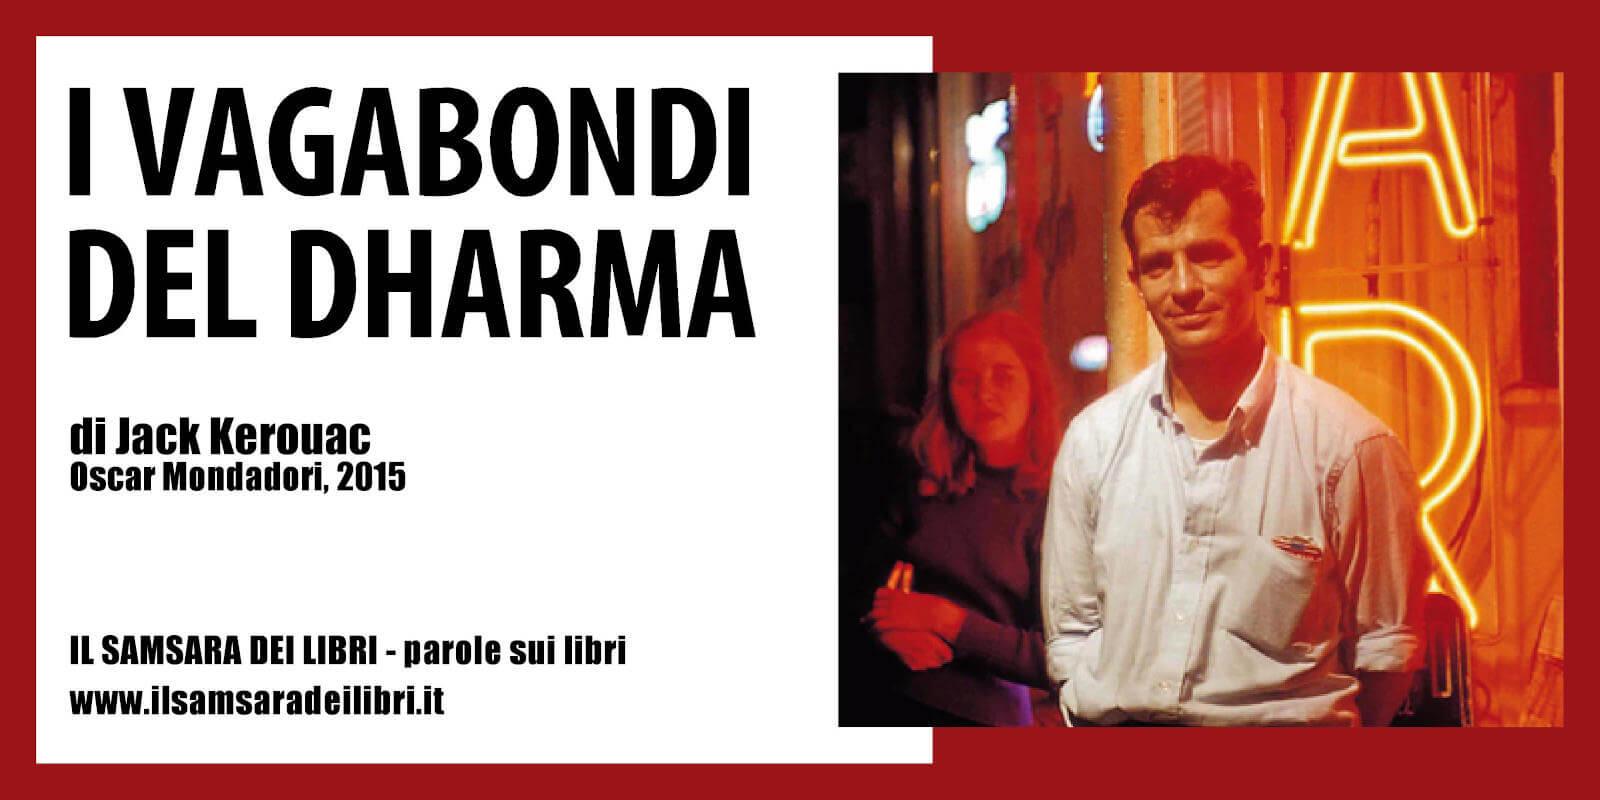 Immagine dellla copertina dedicata a I Vagabondi del Dharma